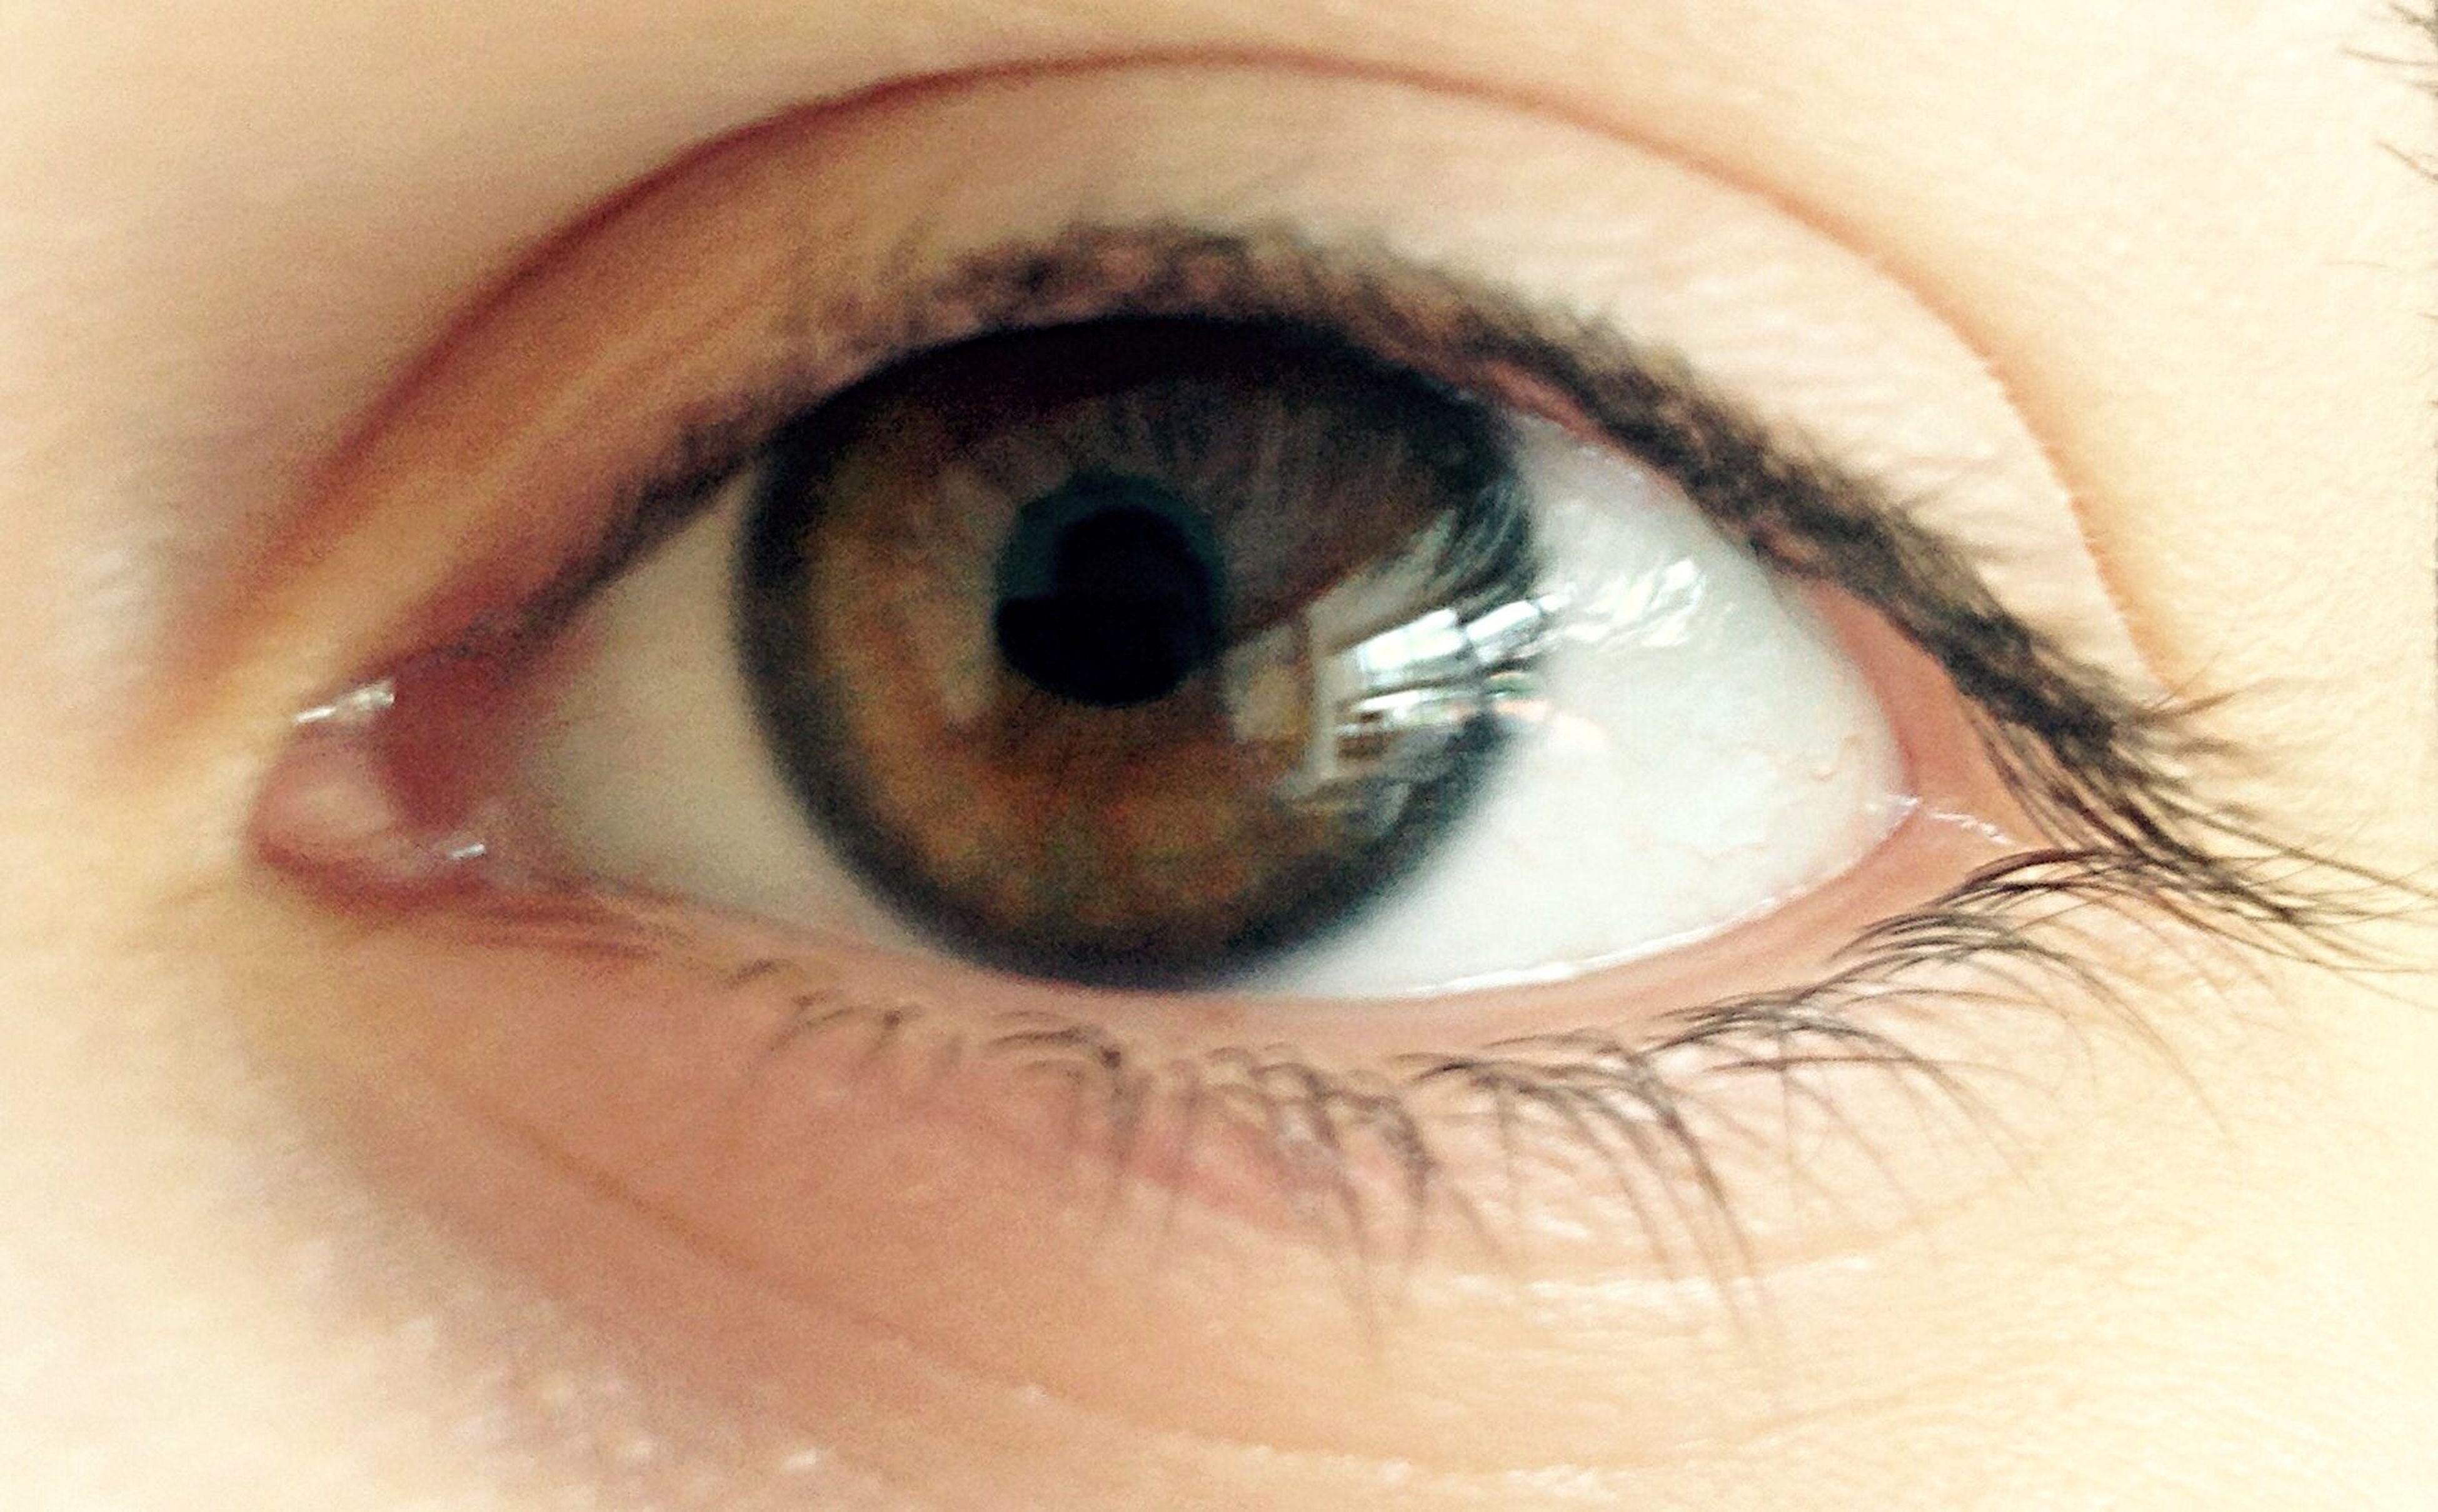 human eye, eyelash, eyesight, sensory perception, close-up, part of, extreme close-up, eyeball, human skin, iris - eye, looking at camera, portrait, extreme close up, full frame, unrecognizable person, eye, vision